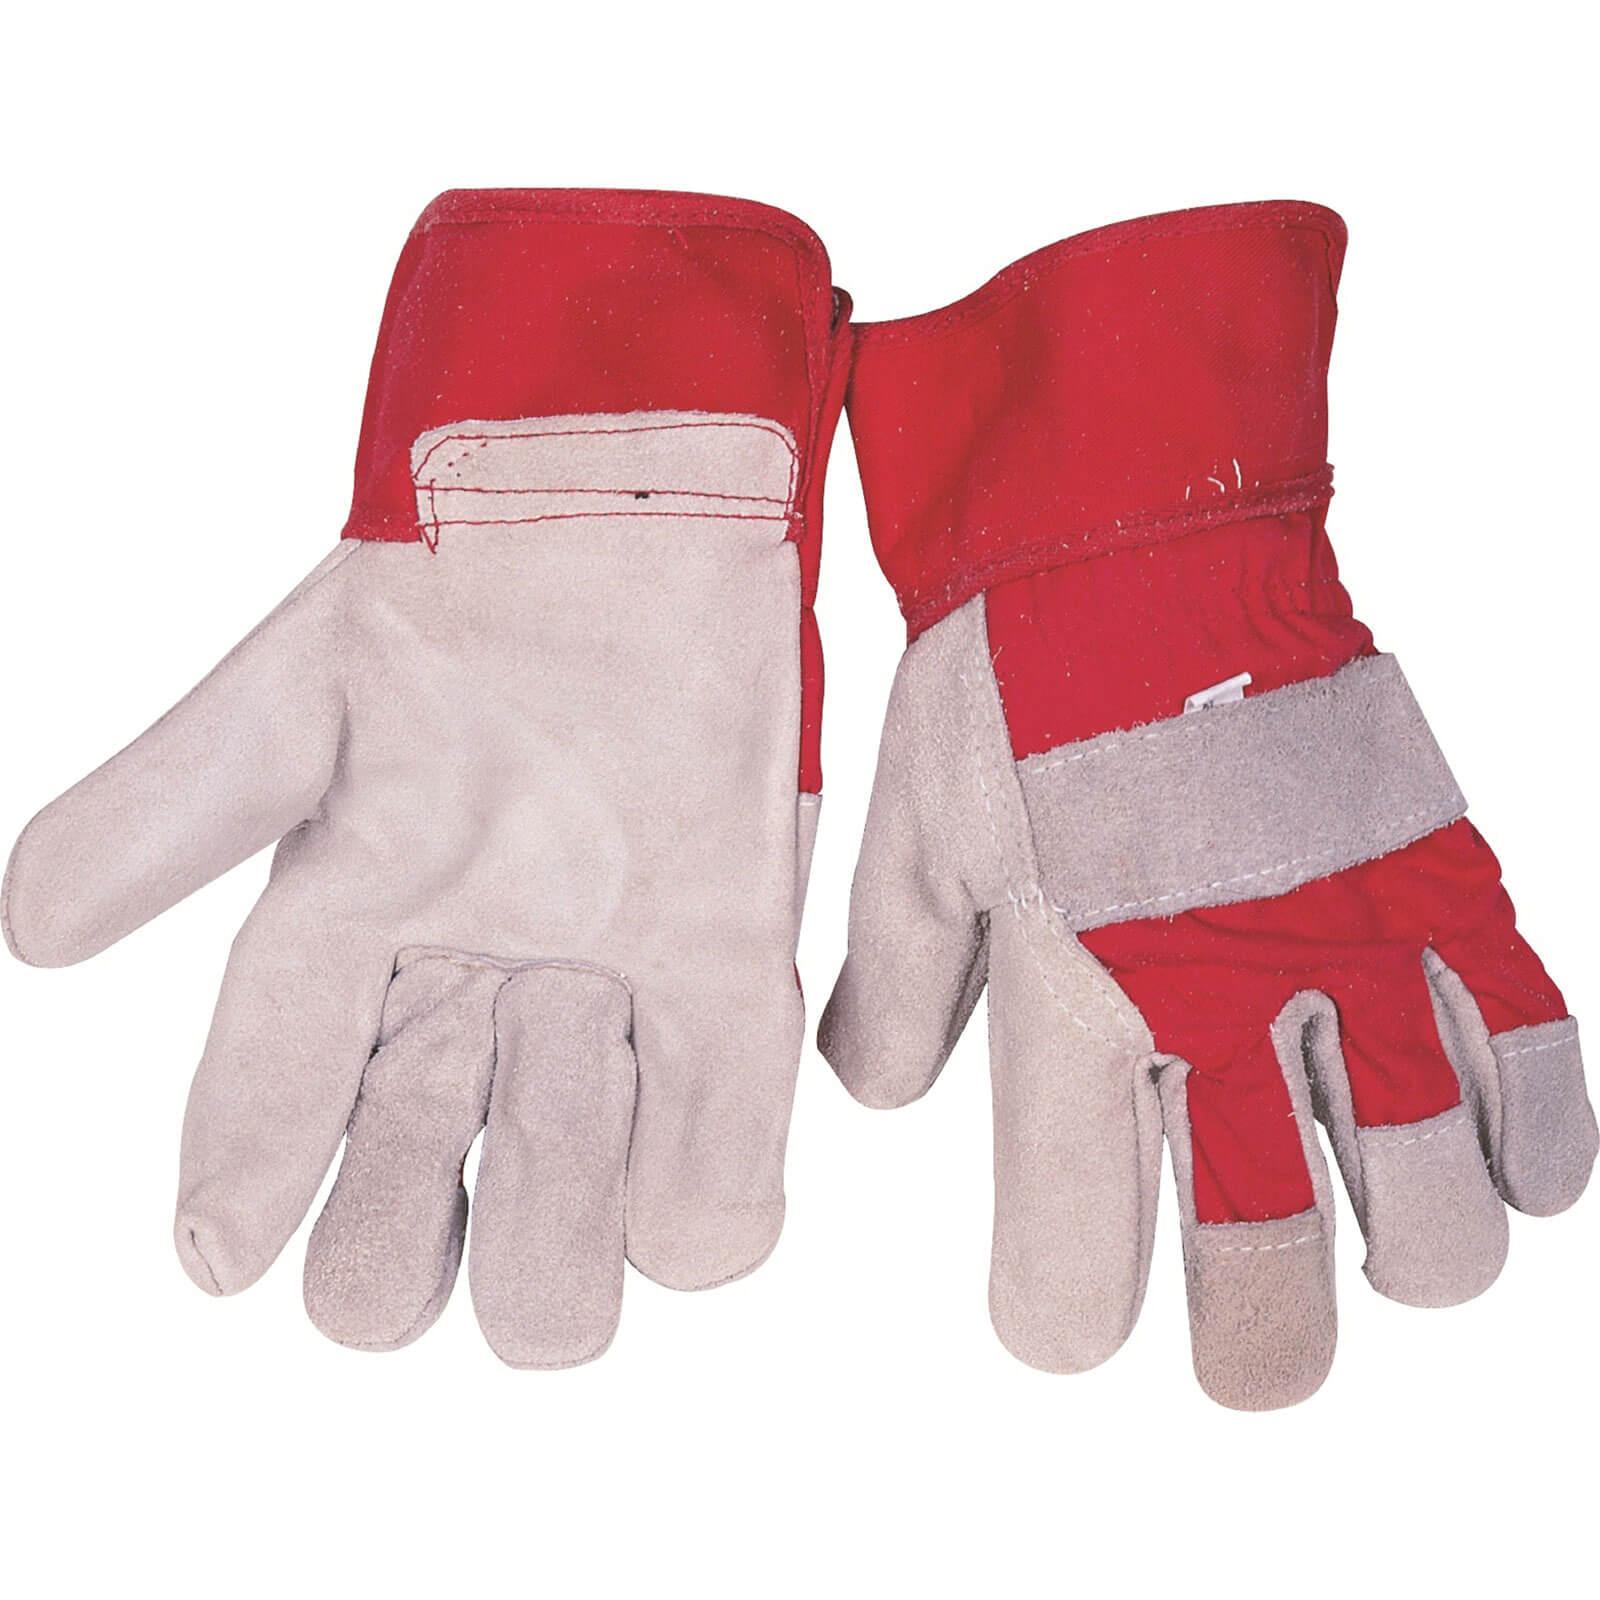 Vitrex Premium Heavy Duty Rigger Gloves XL